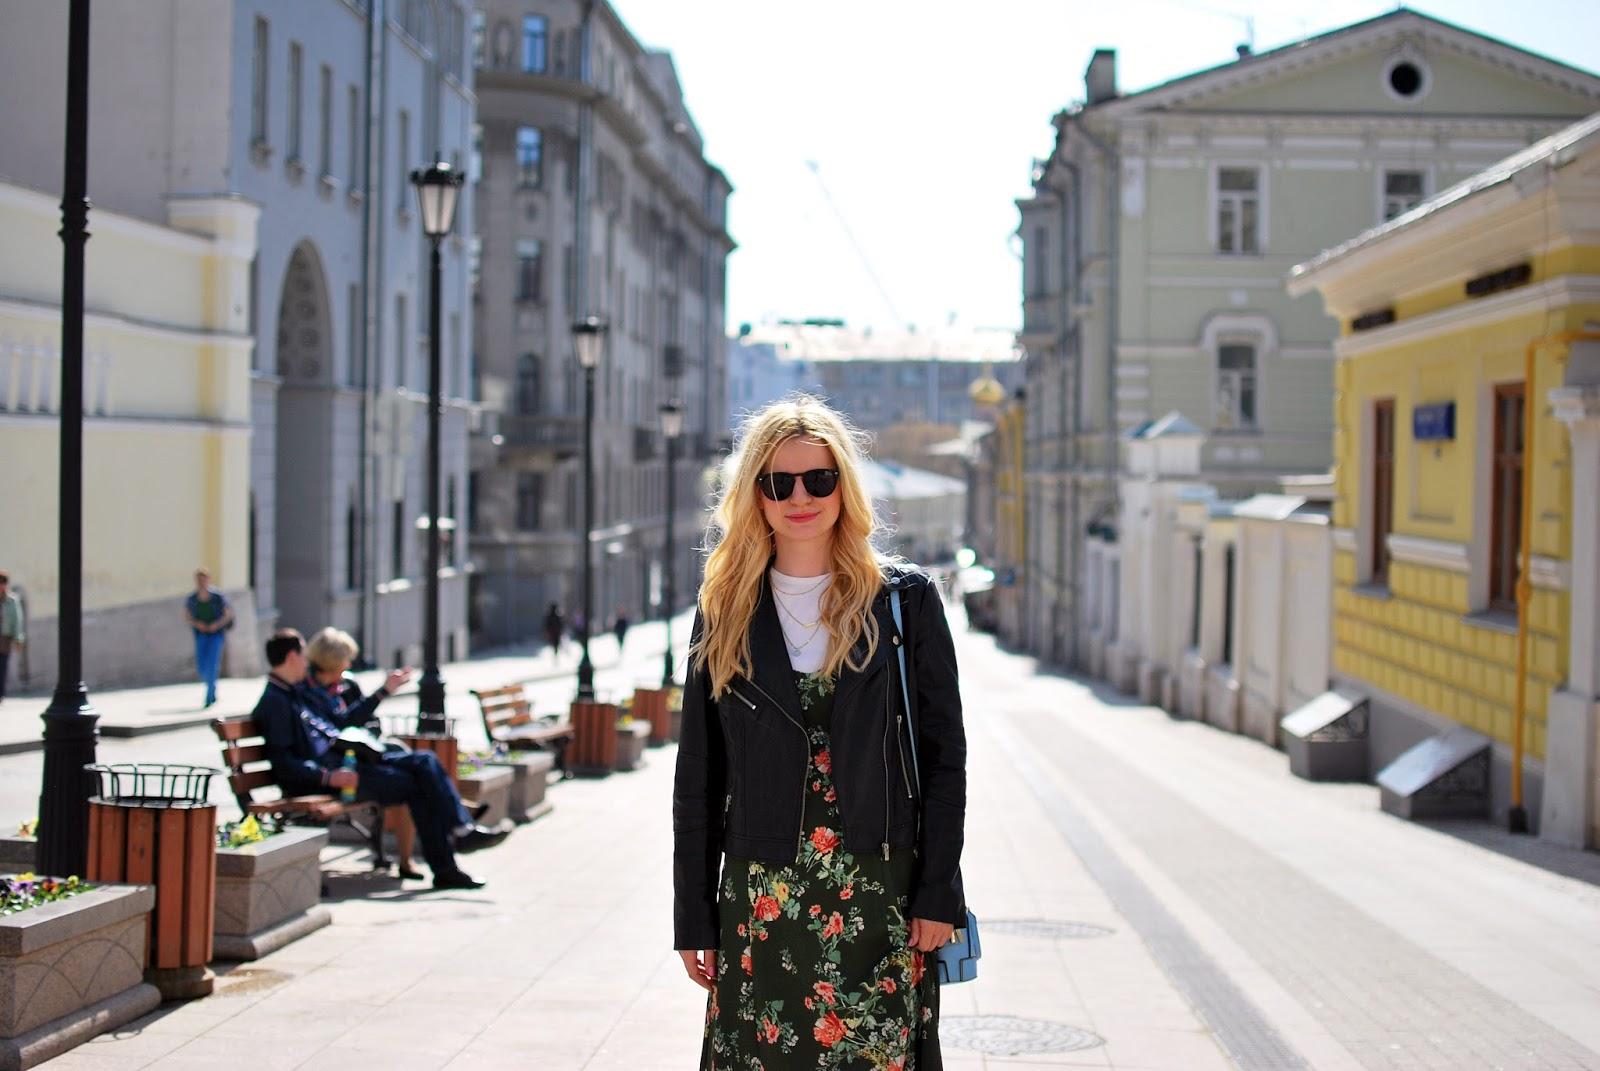 фото модный, модный блог фото, модный лук, луки весна